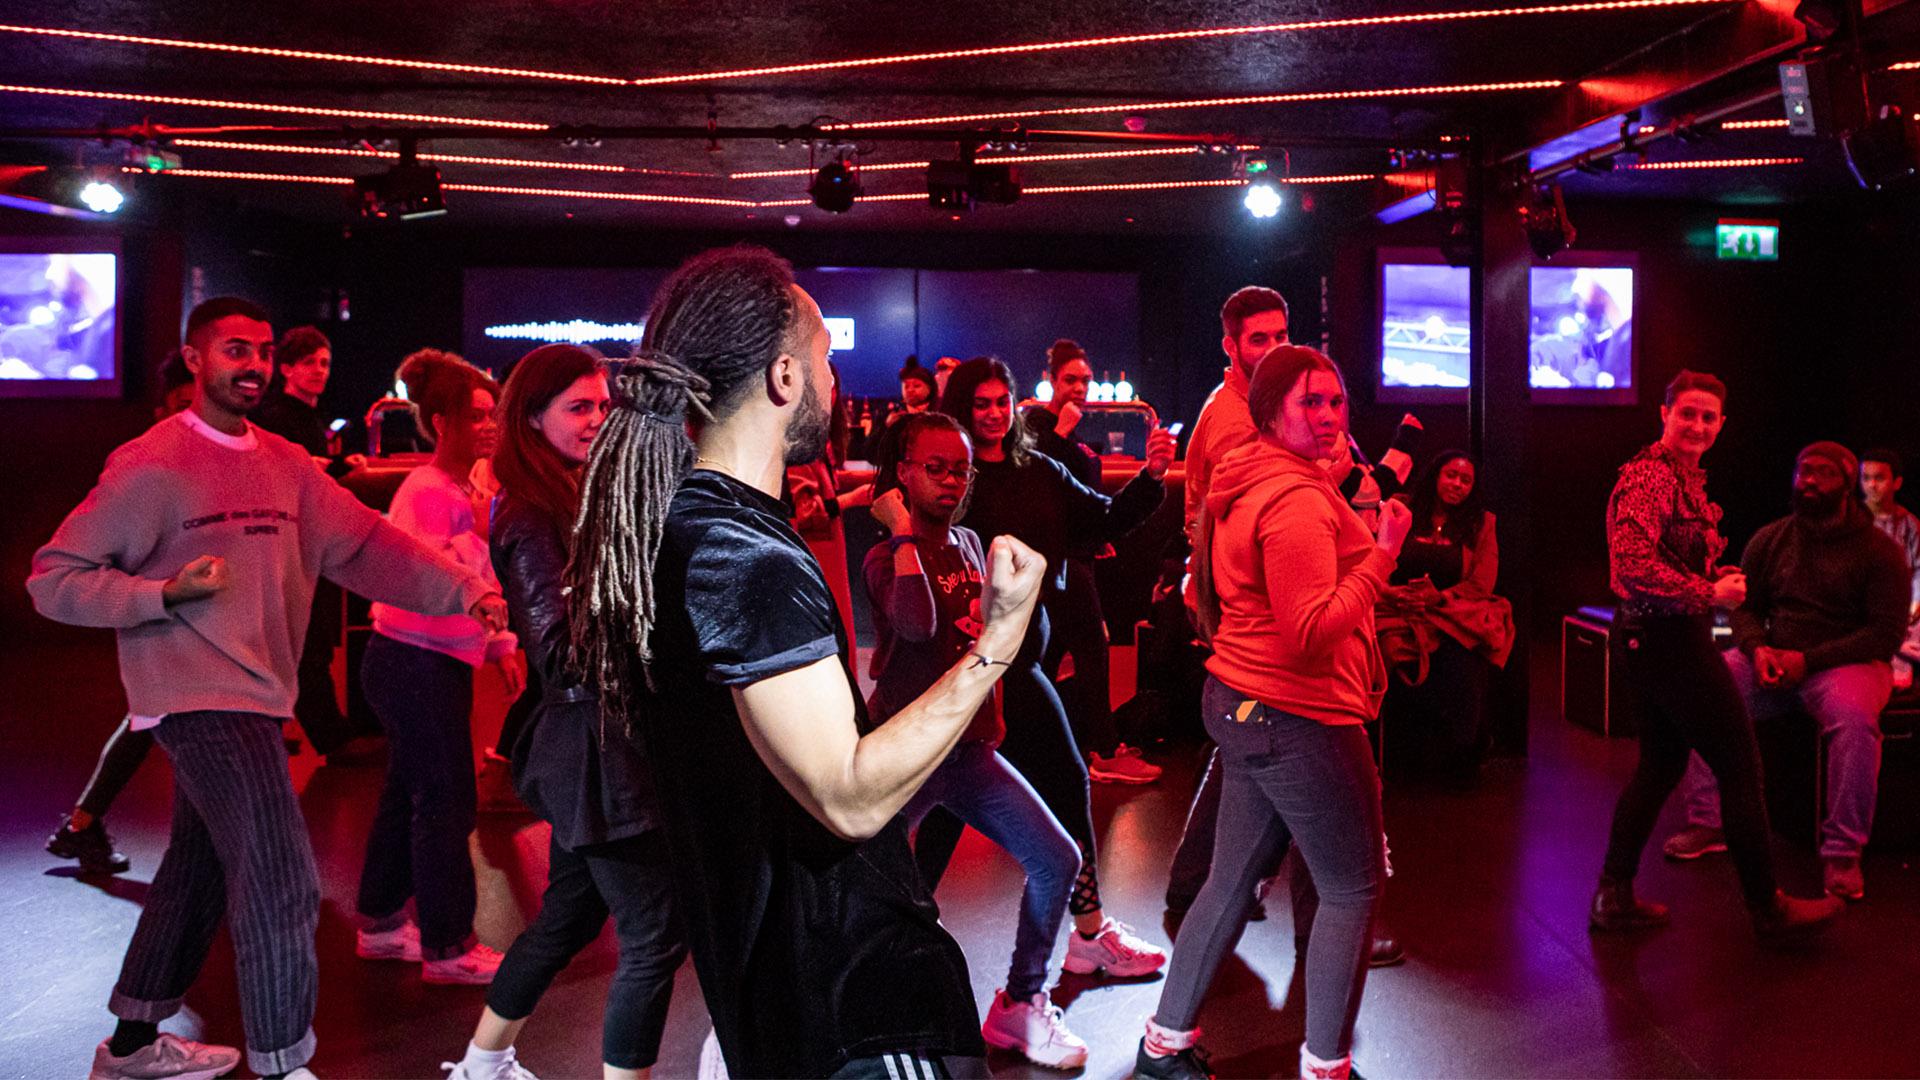 HipHop Dance Event